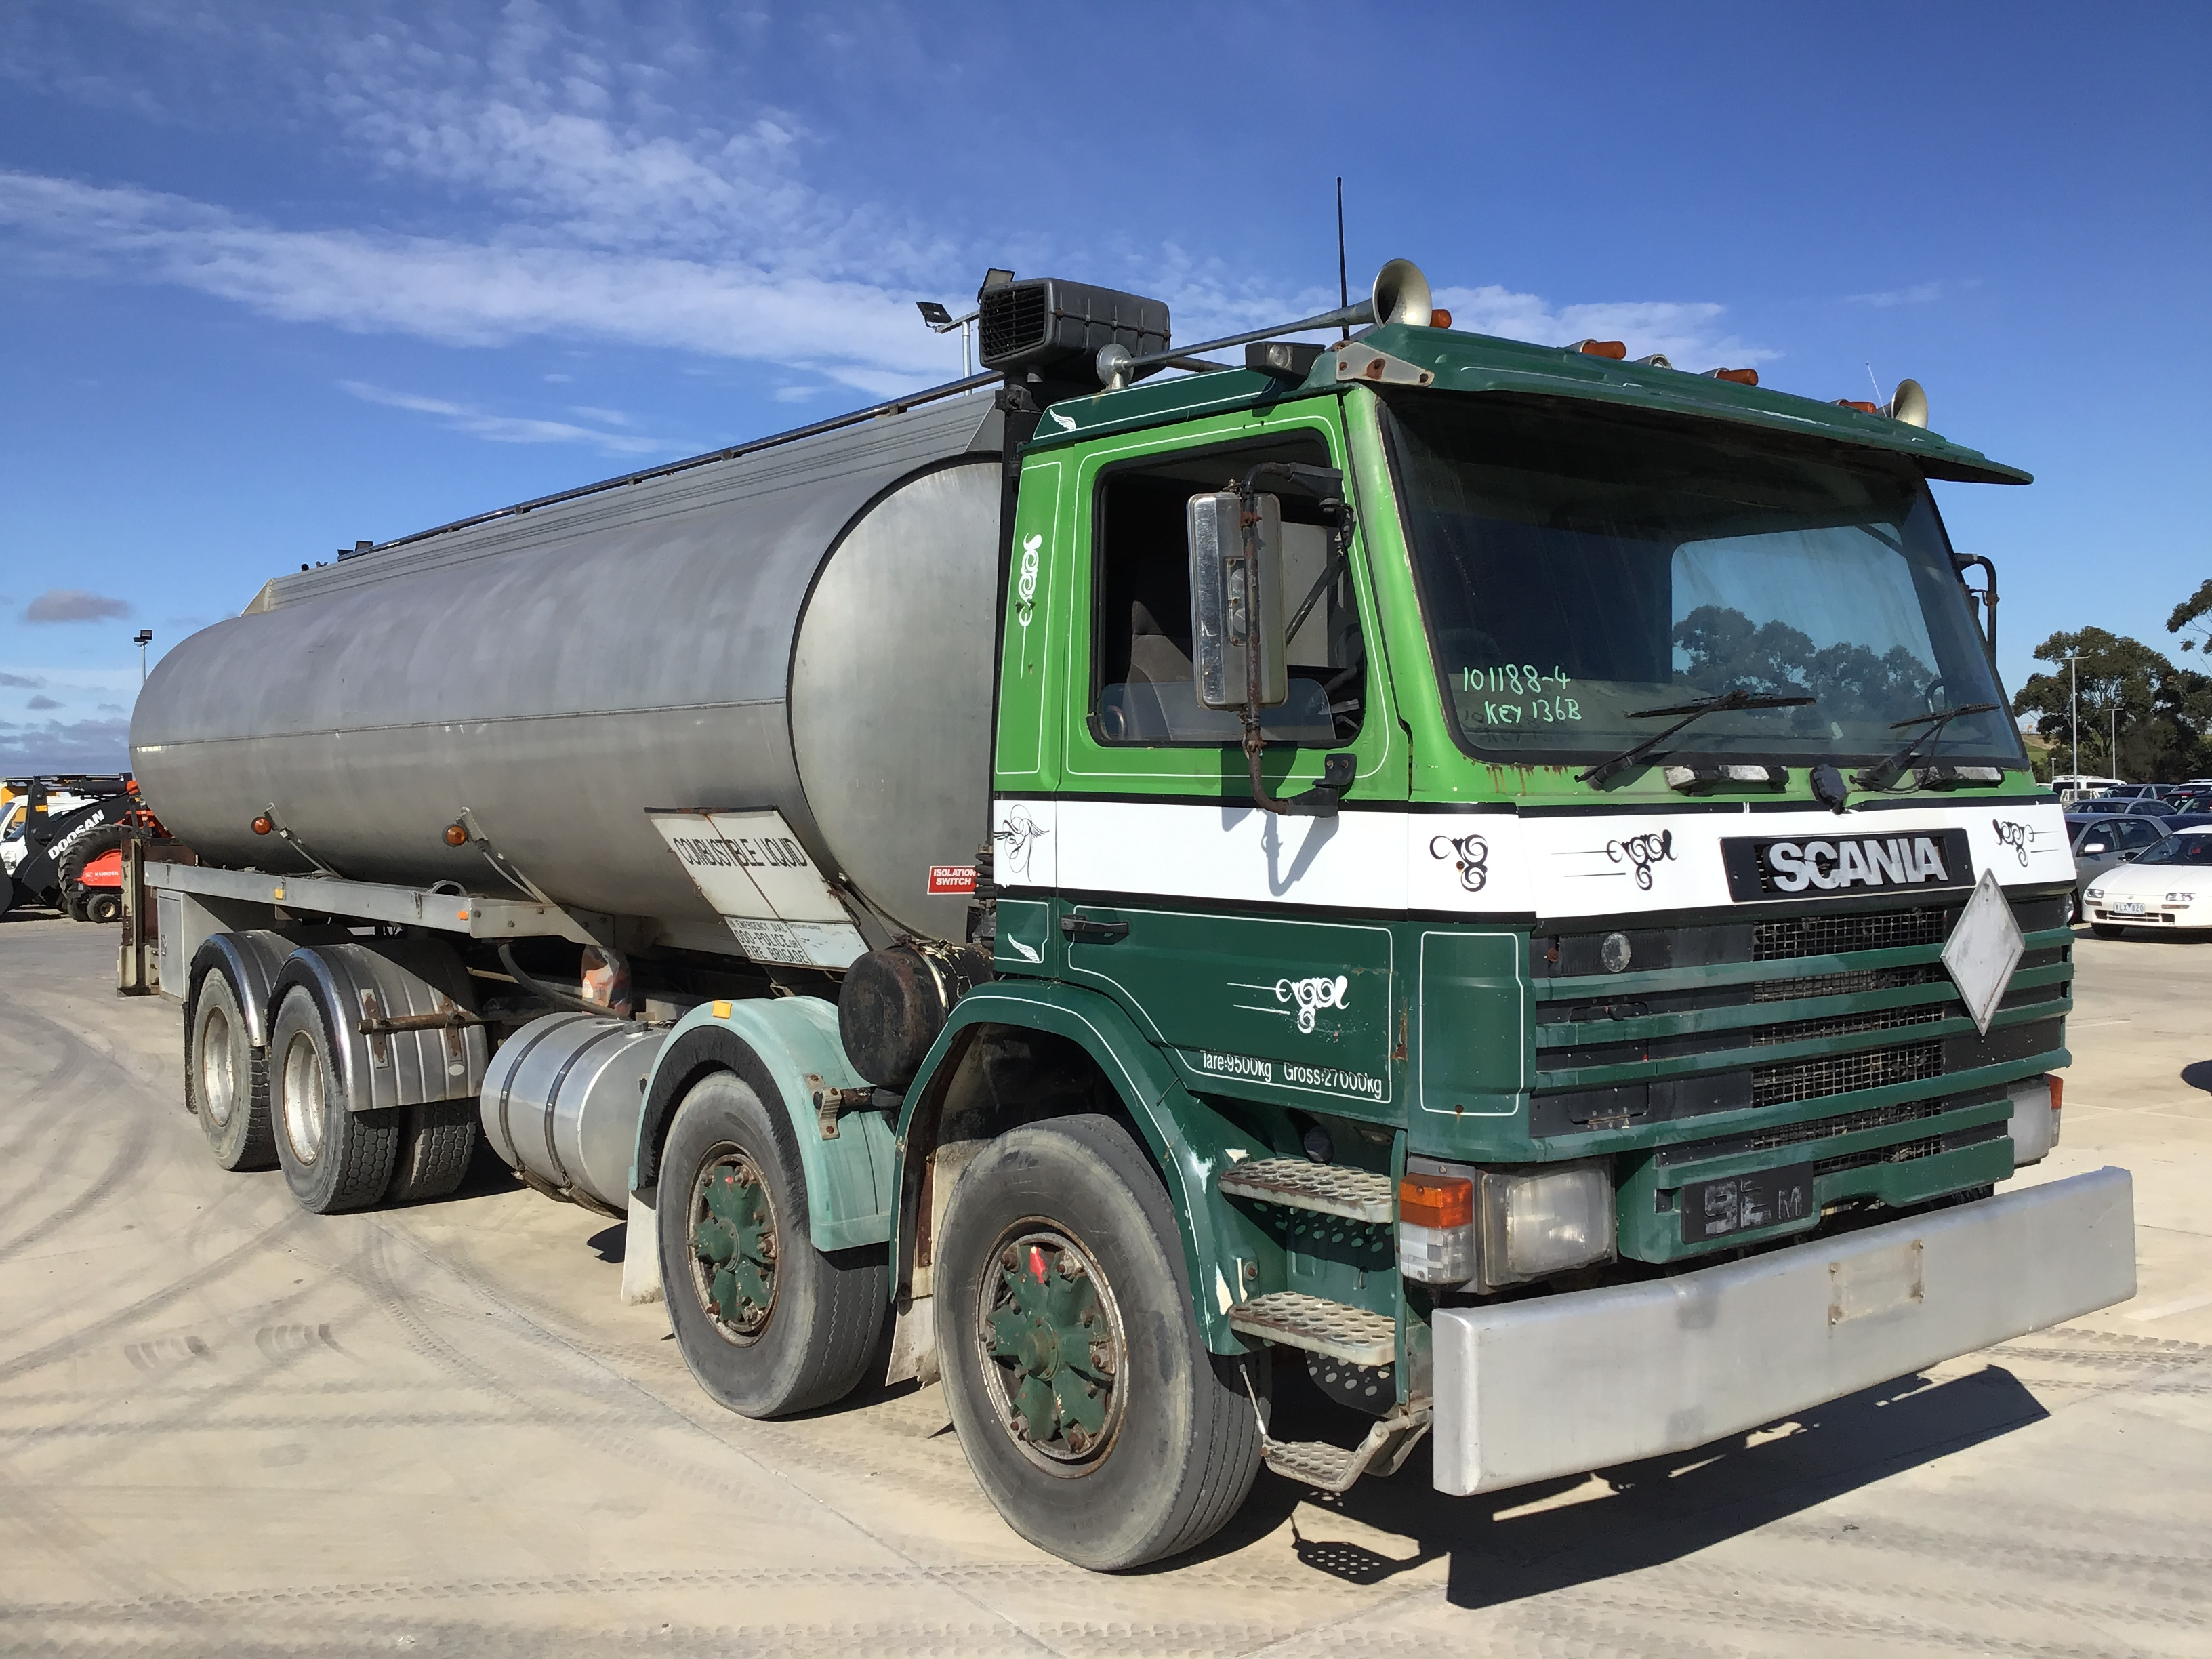 1987 Scania P92M 8 x 2 Fuel Truck